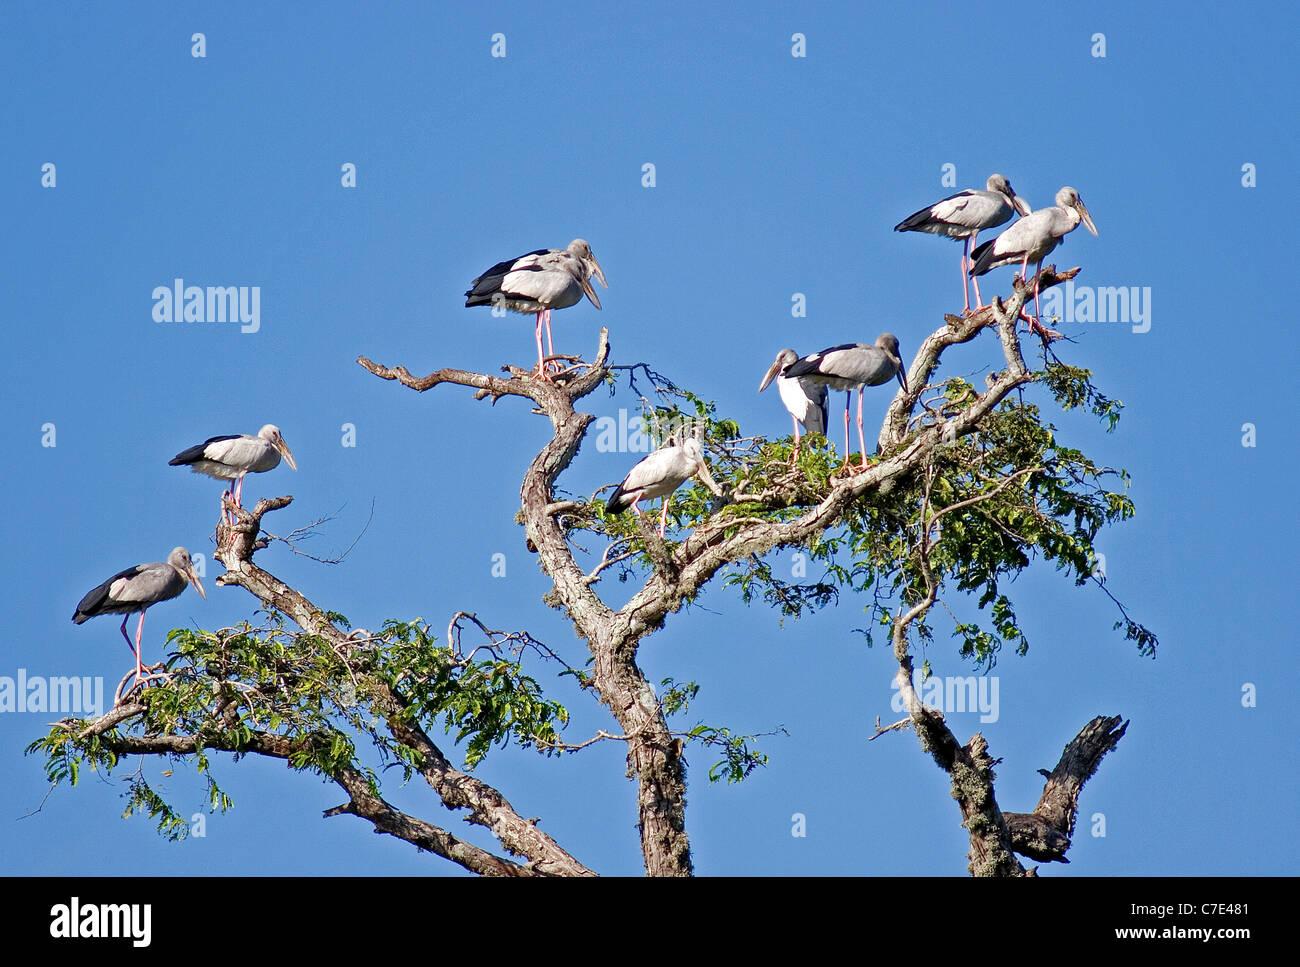 Asiatische offen in Rechnung Storksanastomus Oscitans Sri Lanka Stockbild